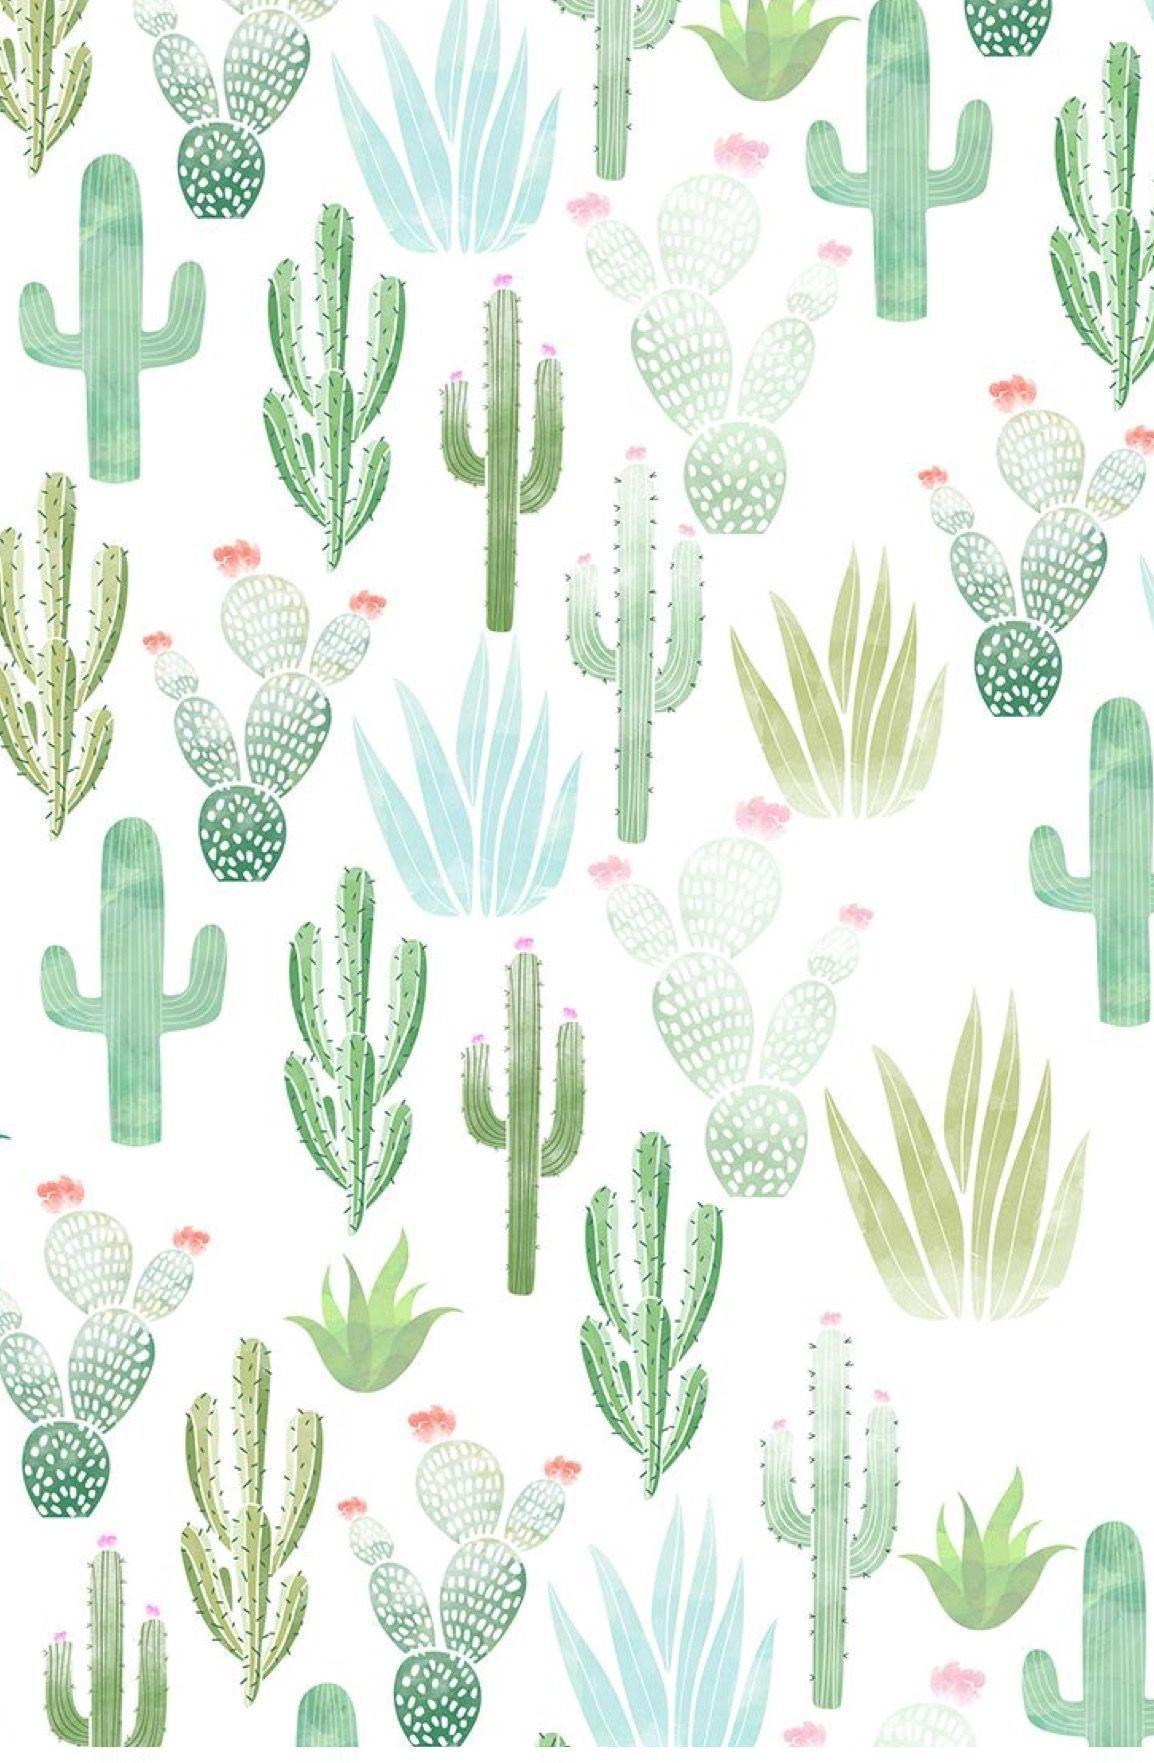 Aesthetic Cactus Desktop Wallpaper: cactus aesthetic, Aesthetic...